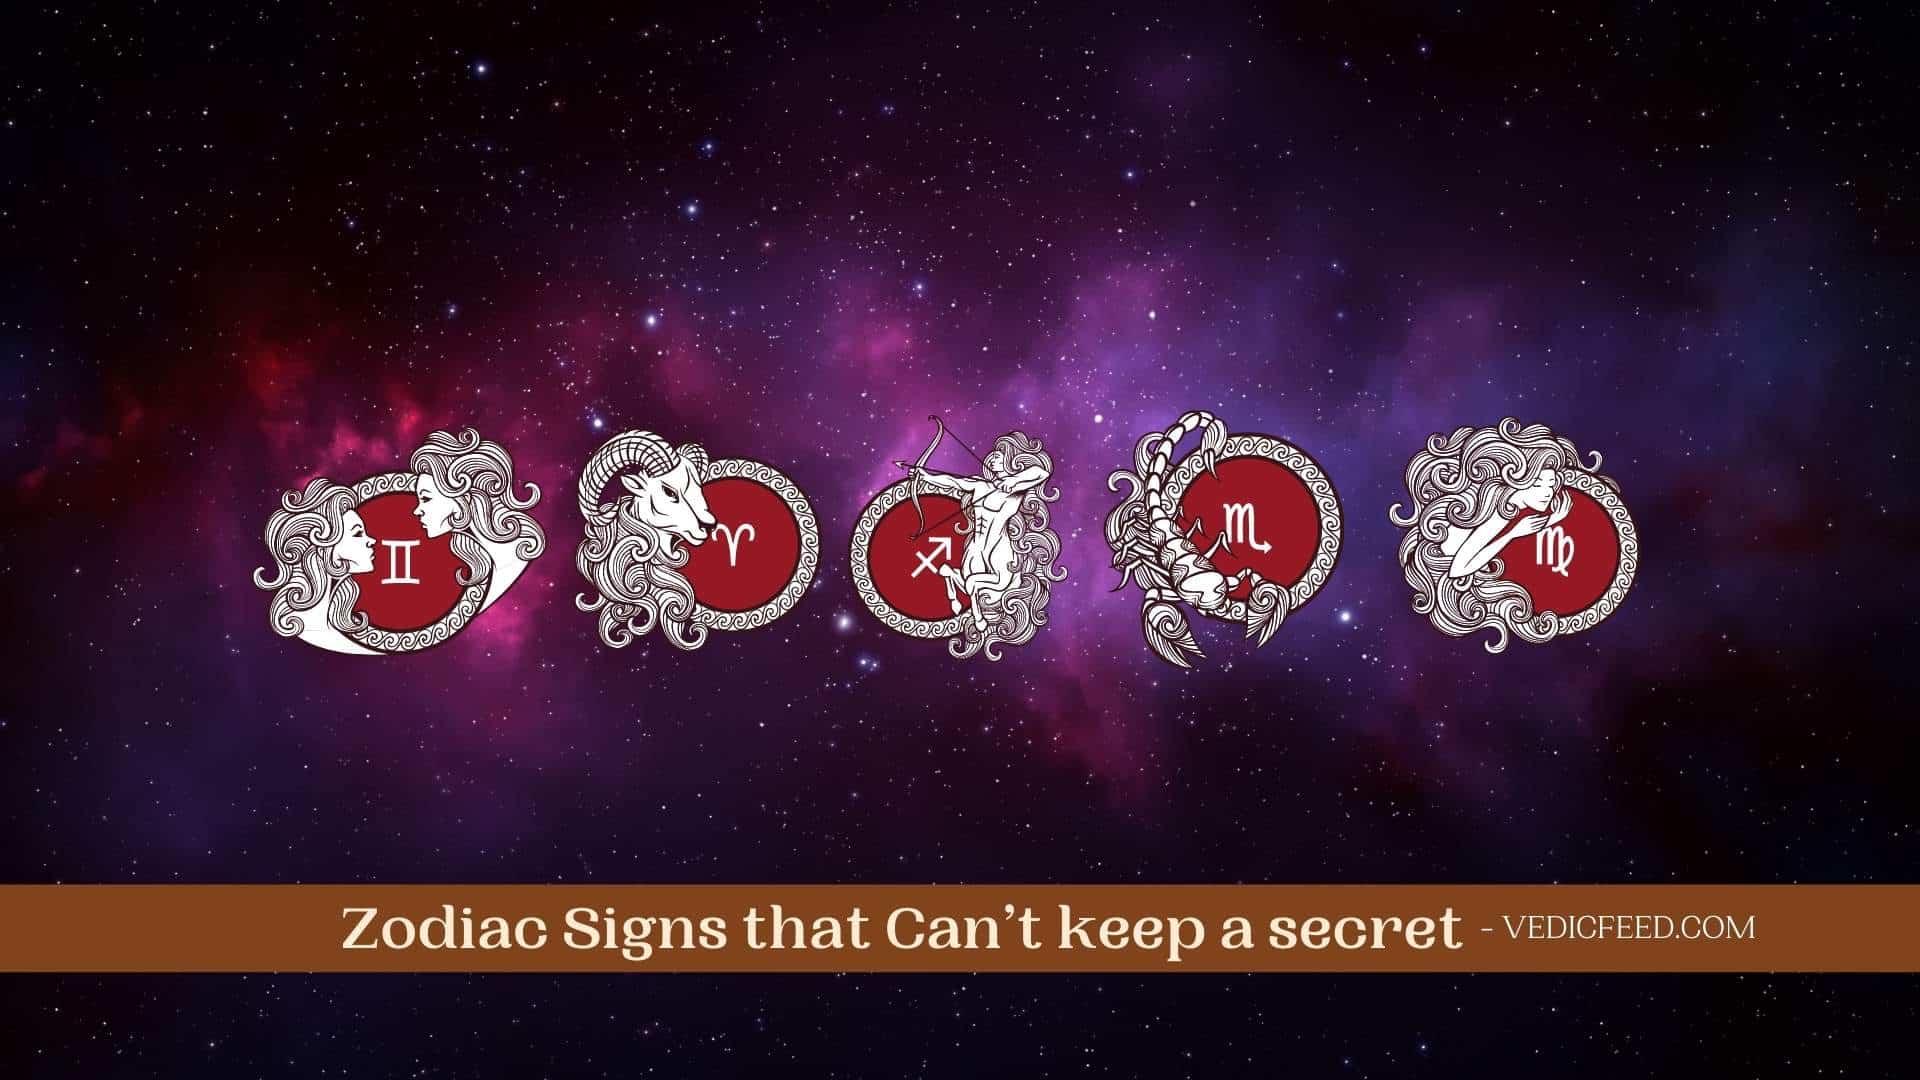 Zodiac Signs that Can't keep secret